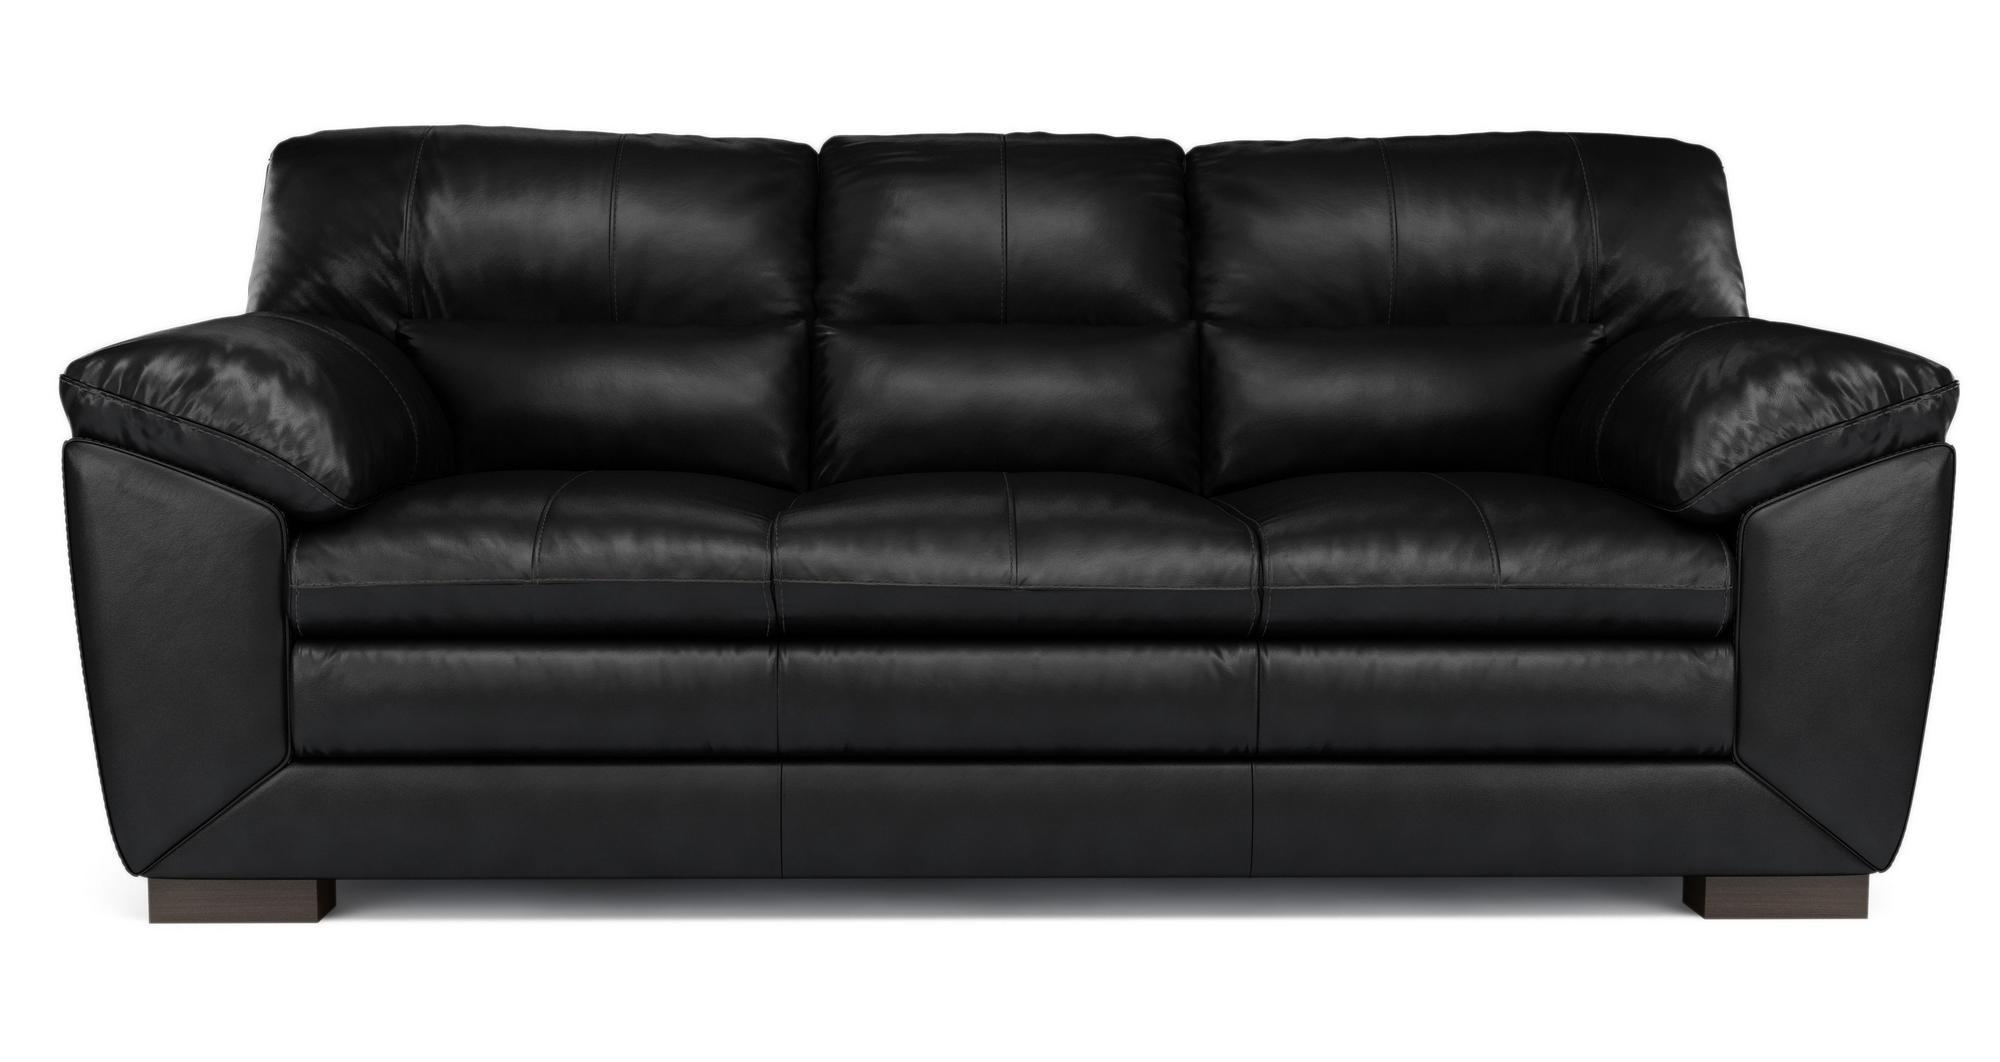 Dfs New Valiant Black Leather 3 Seater Sofa Ebay